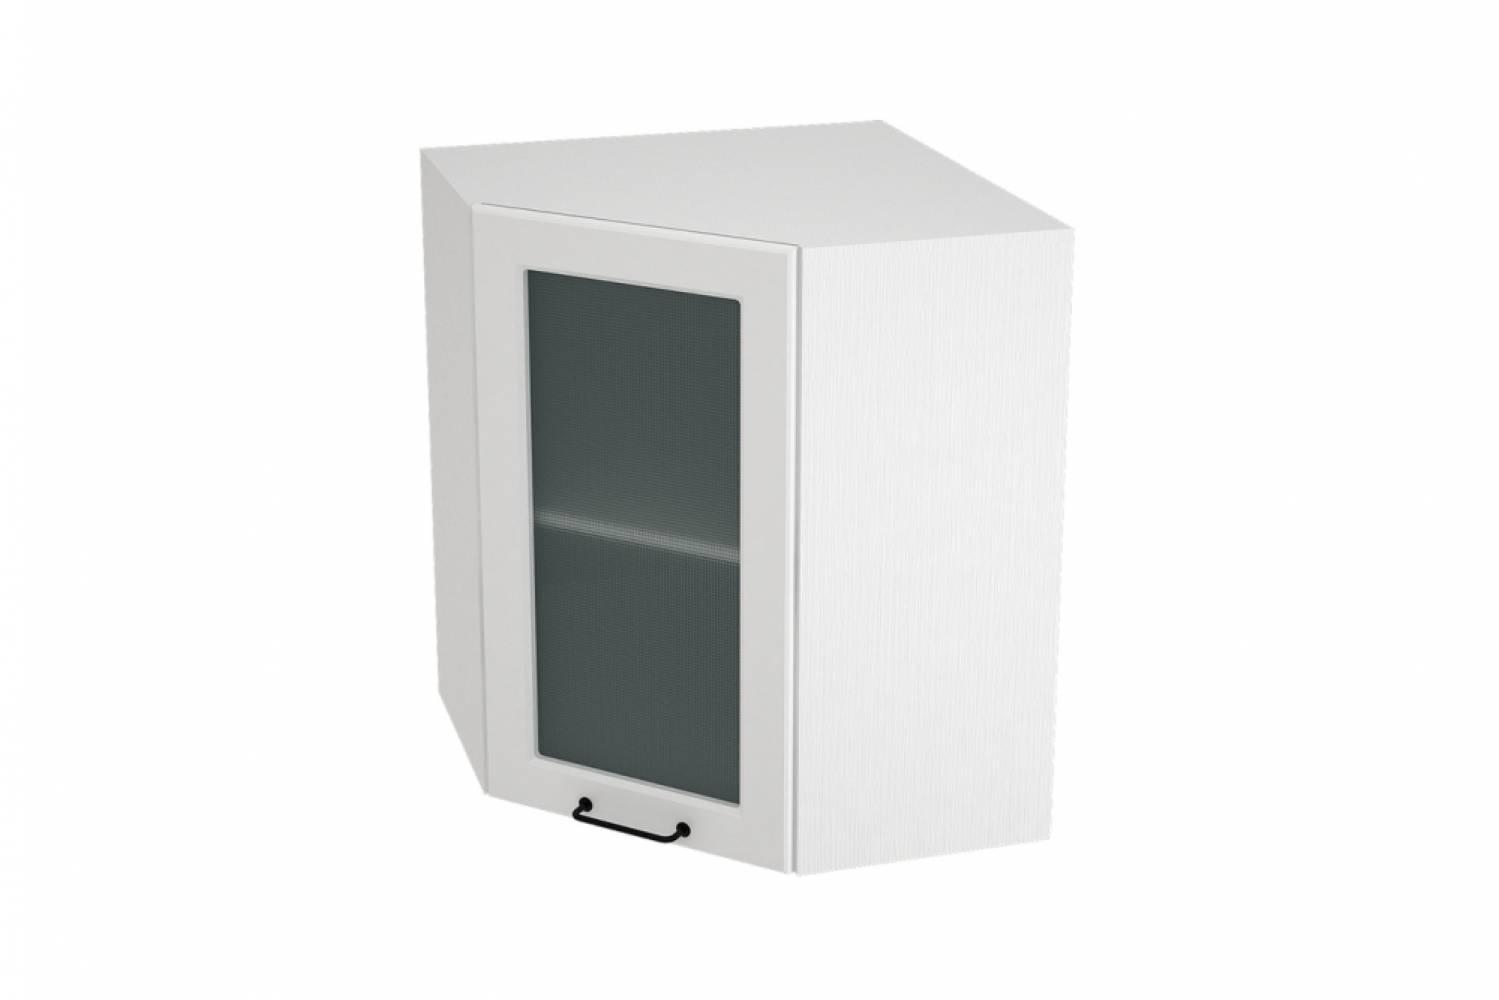 Шкаф верхний угловой со стеклом ШВУС 590 НИЦЦА ROYAL (BLANCO) 590 мм